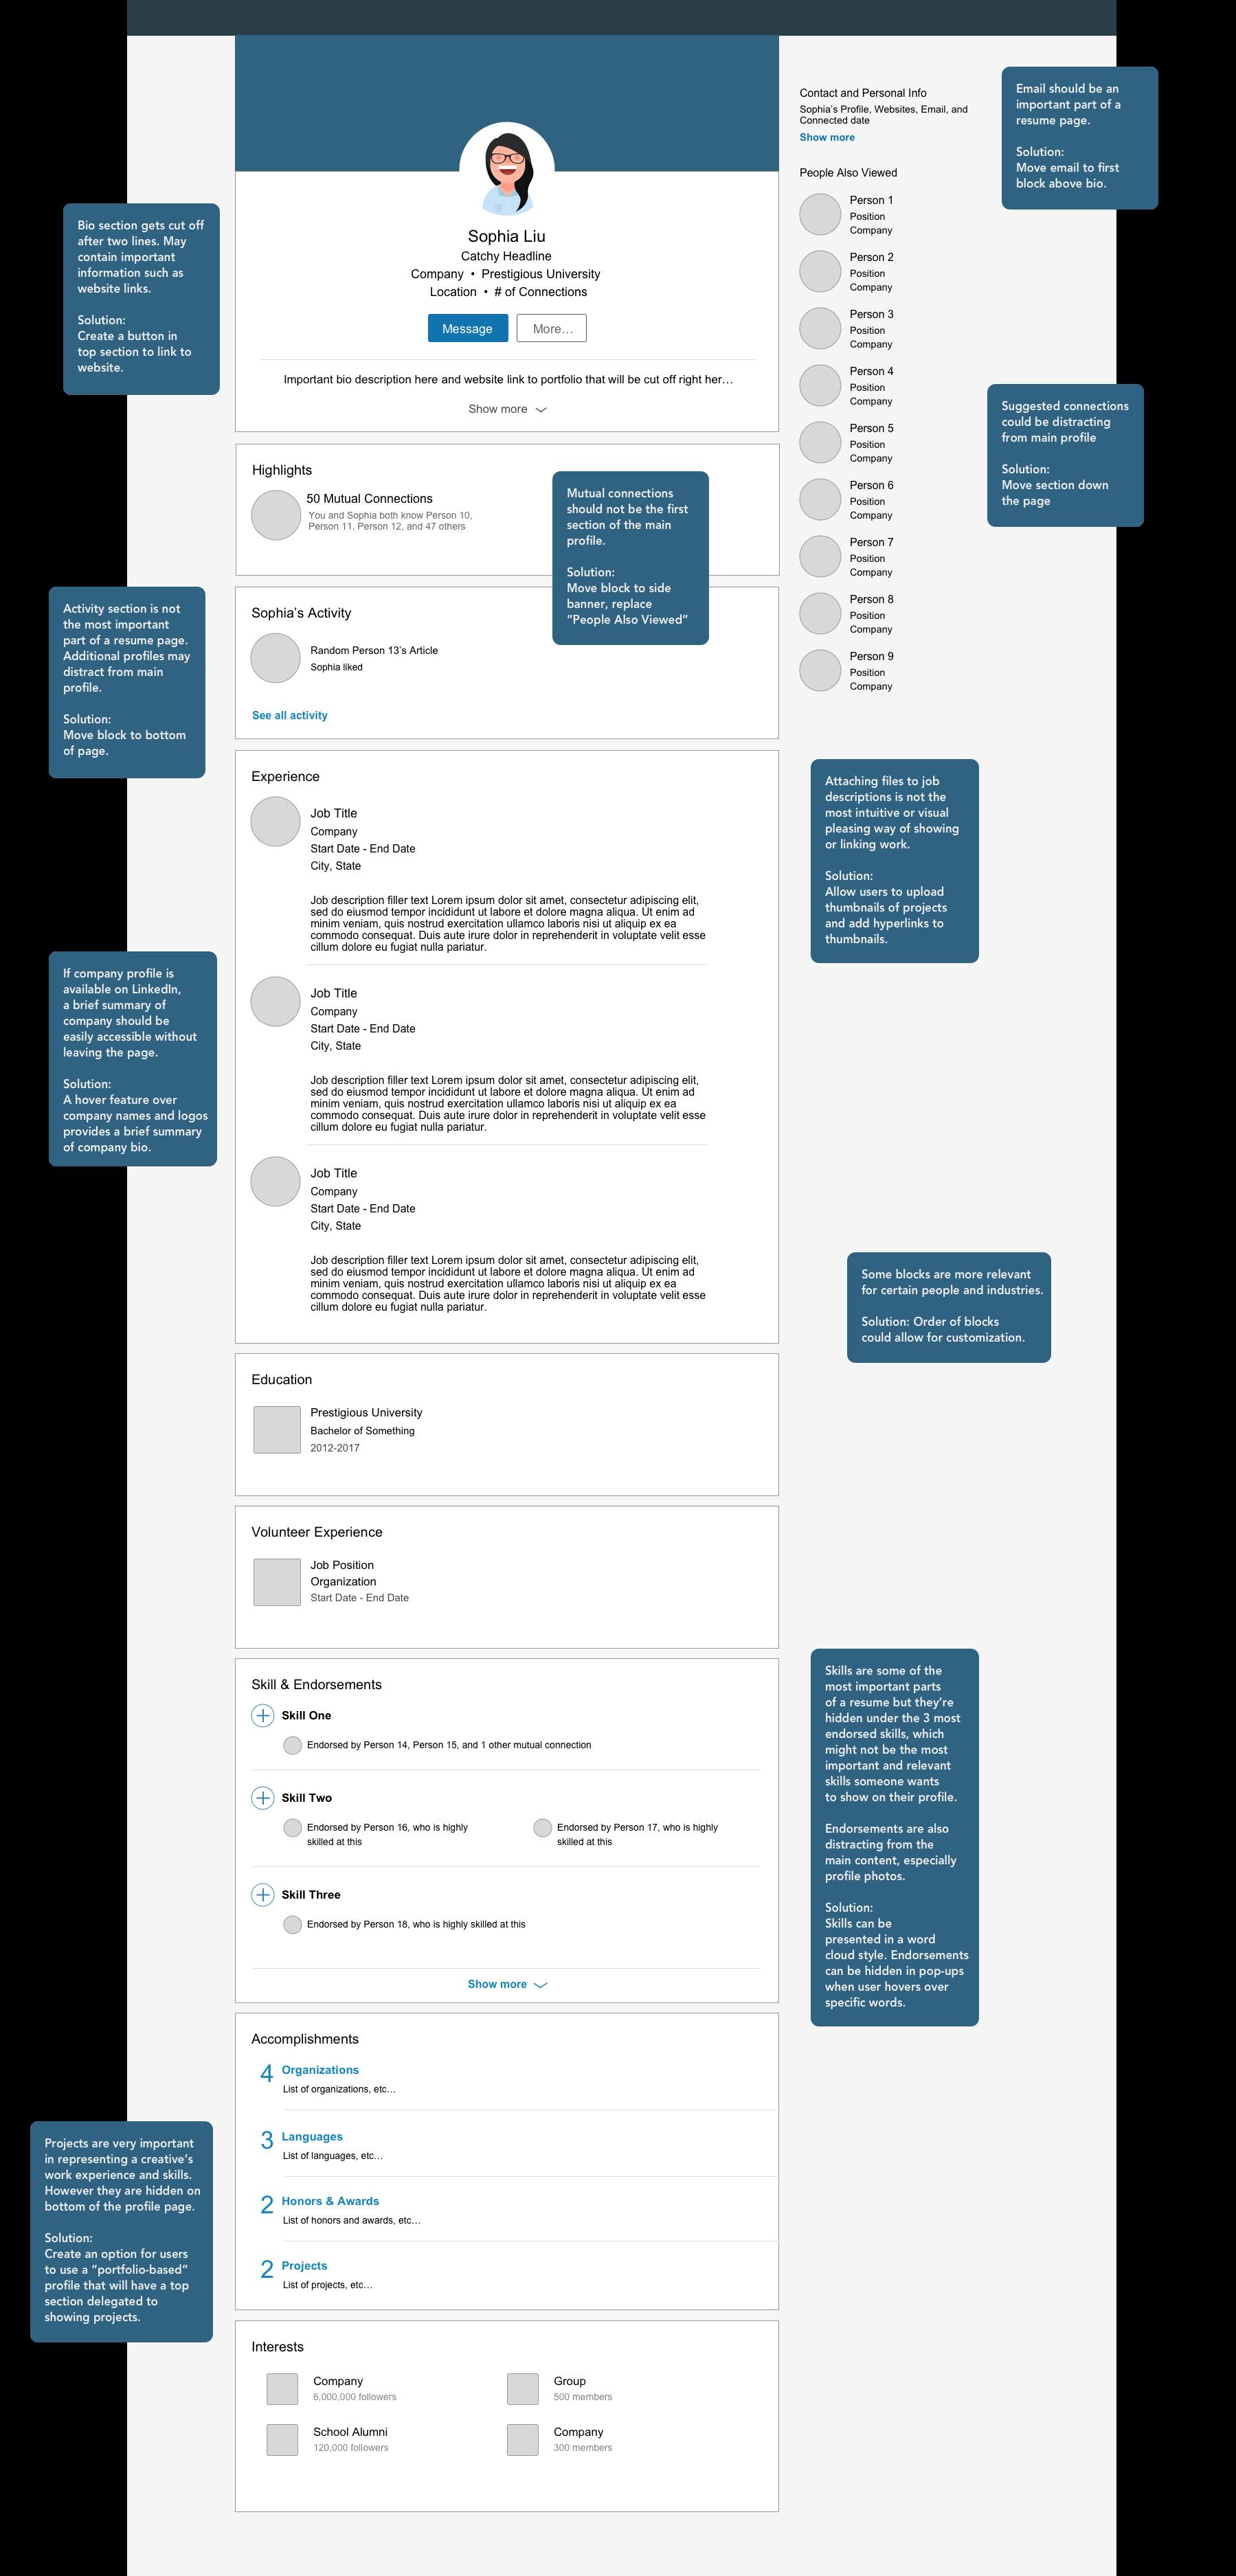 Reference Linkedin Analysis.png